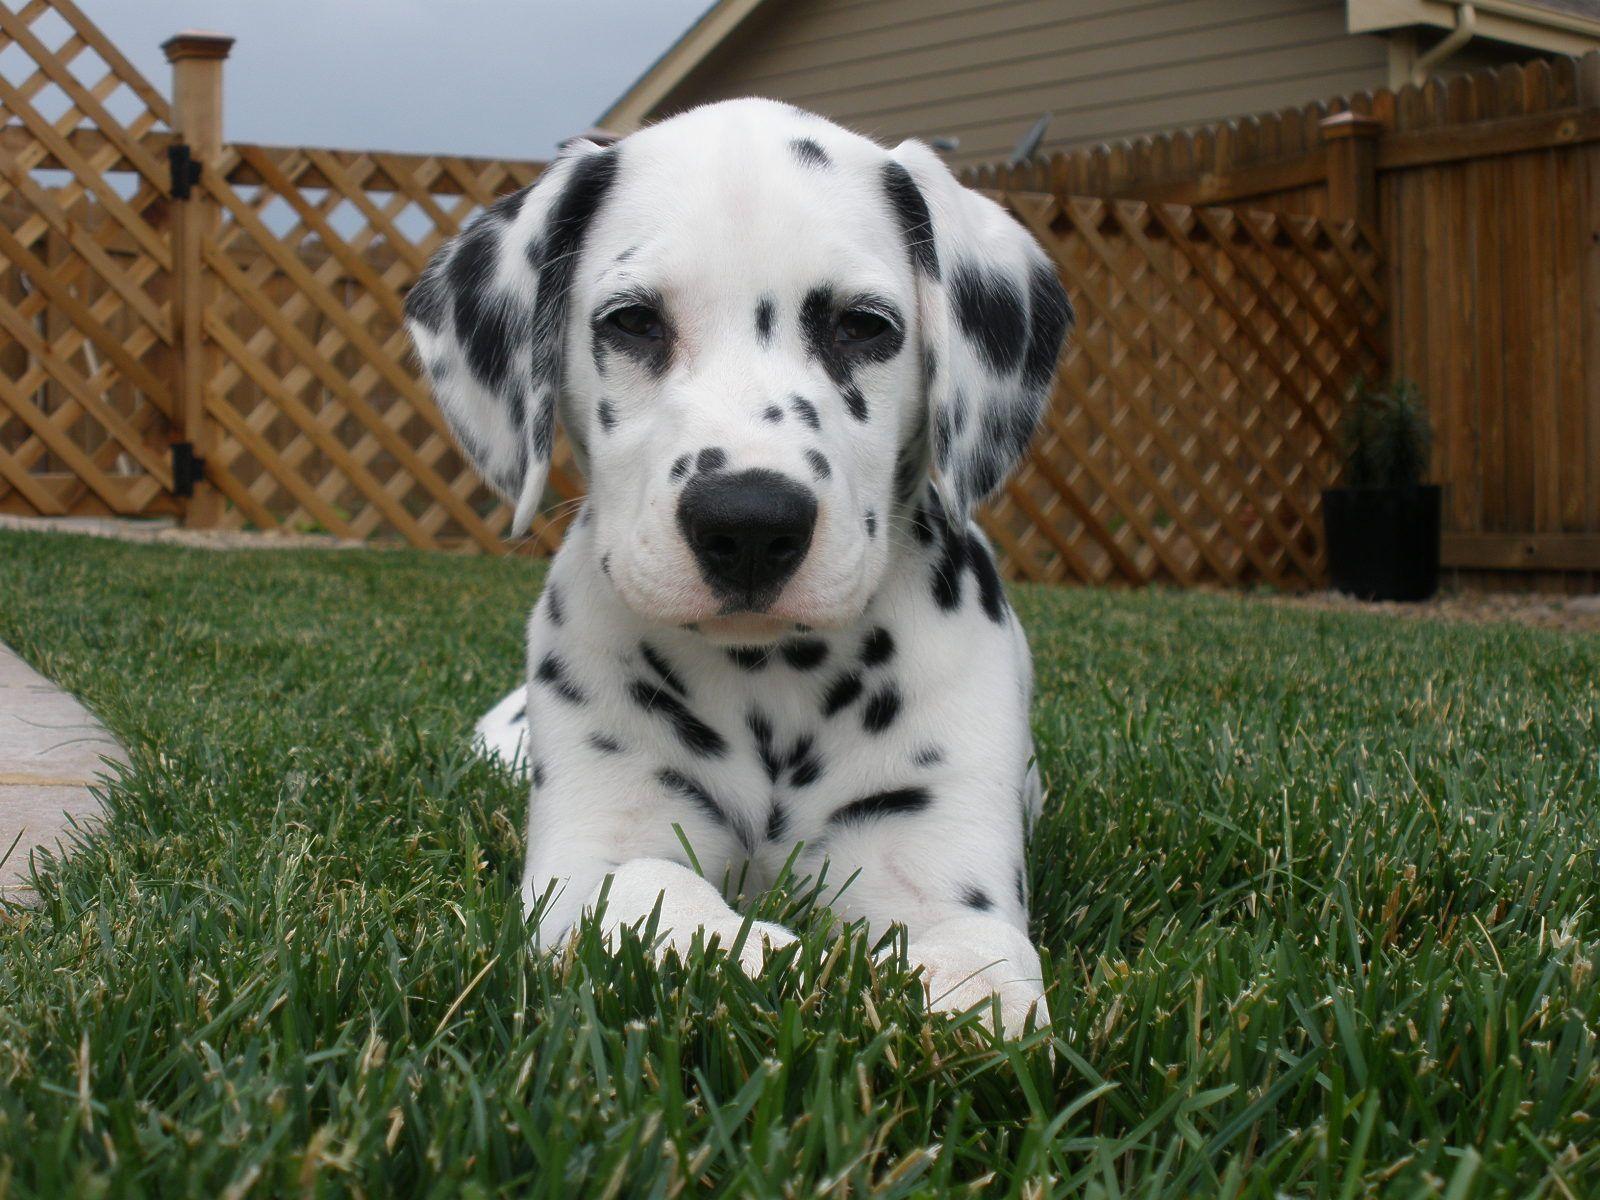 Dalmatian puppy 10 weeks old